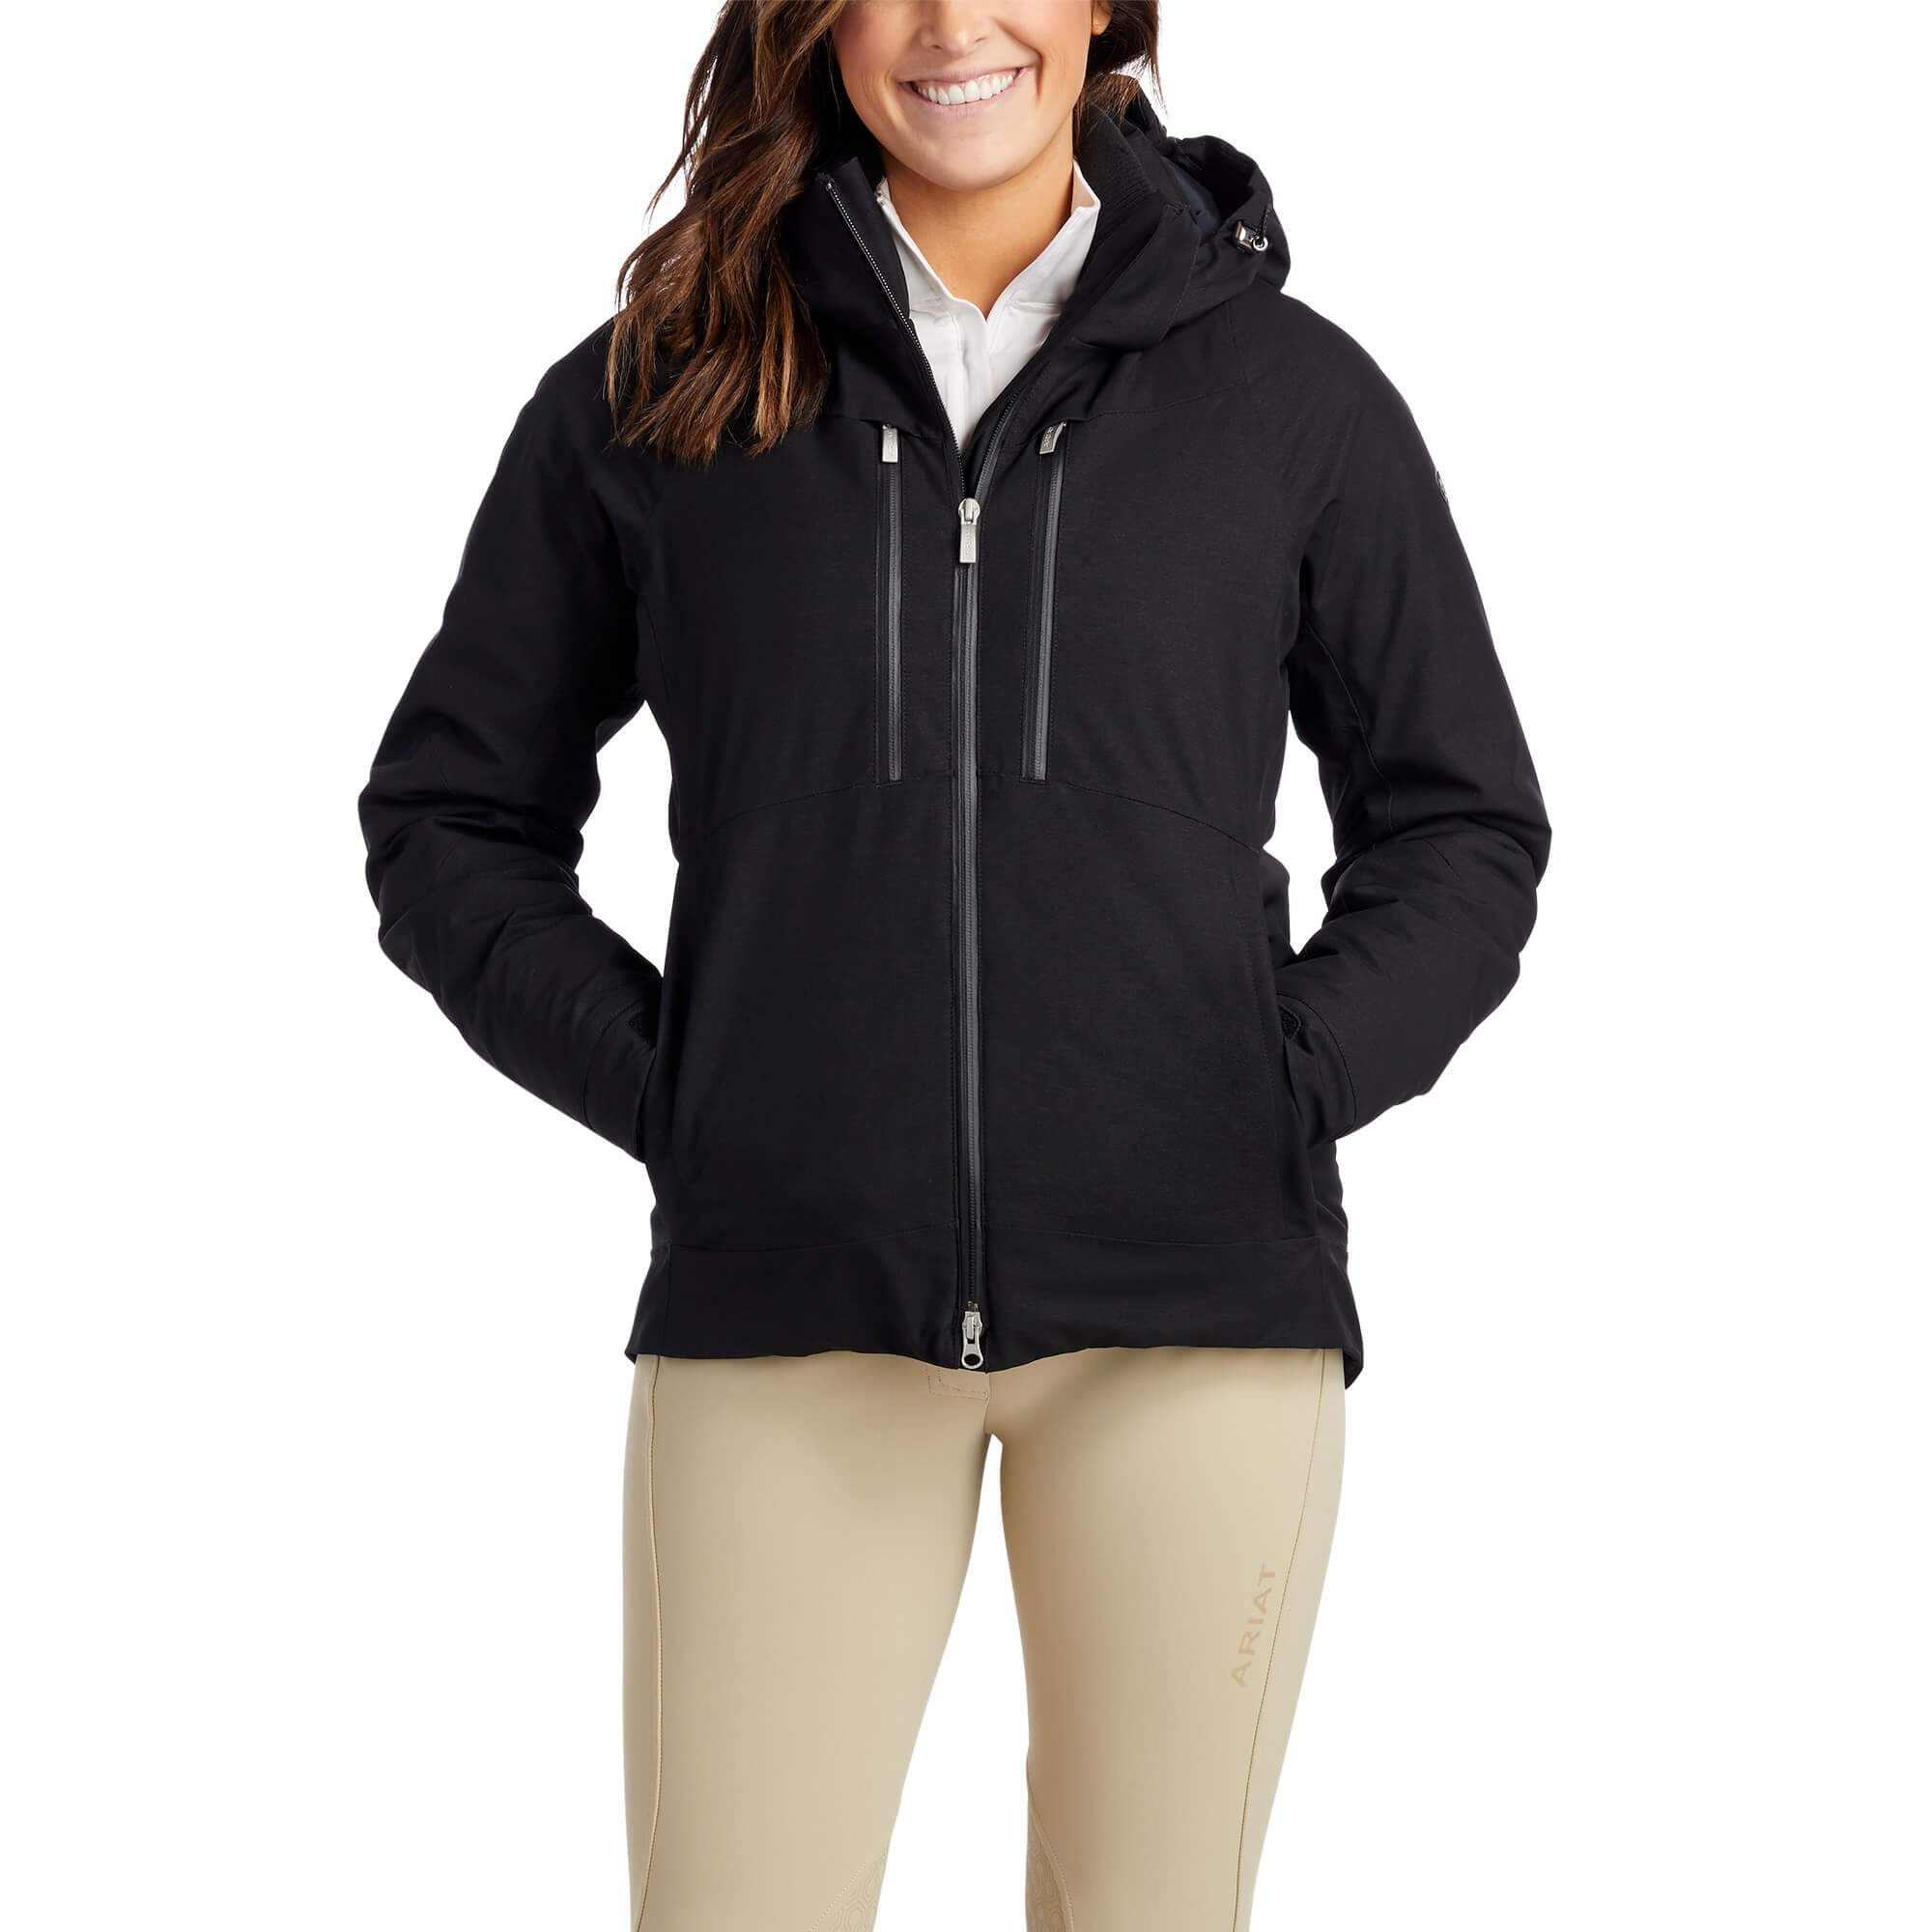 Veracity Waterproof Insulated Jacket